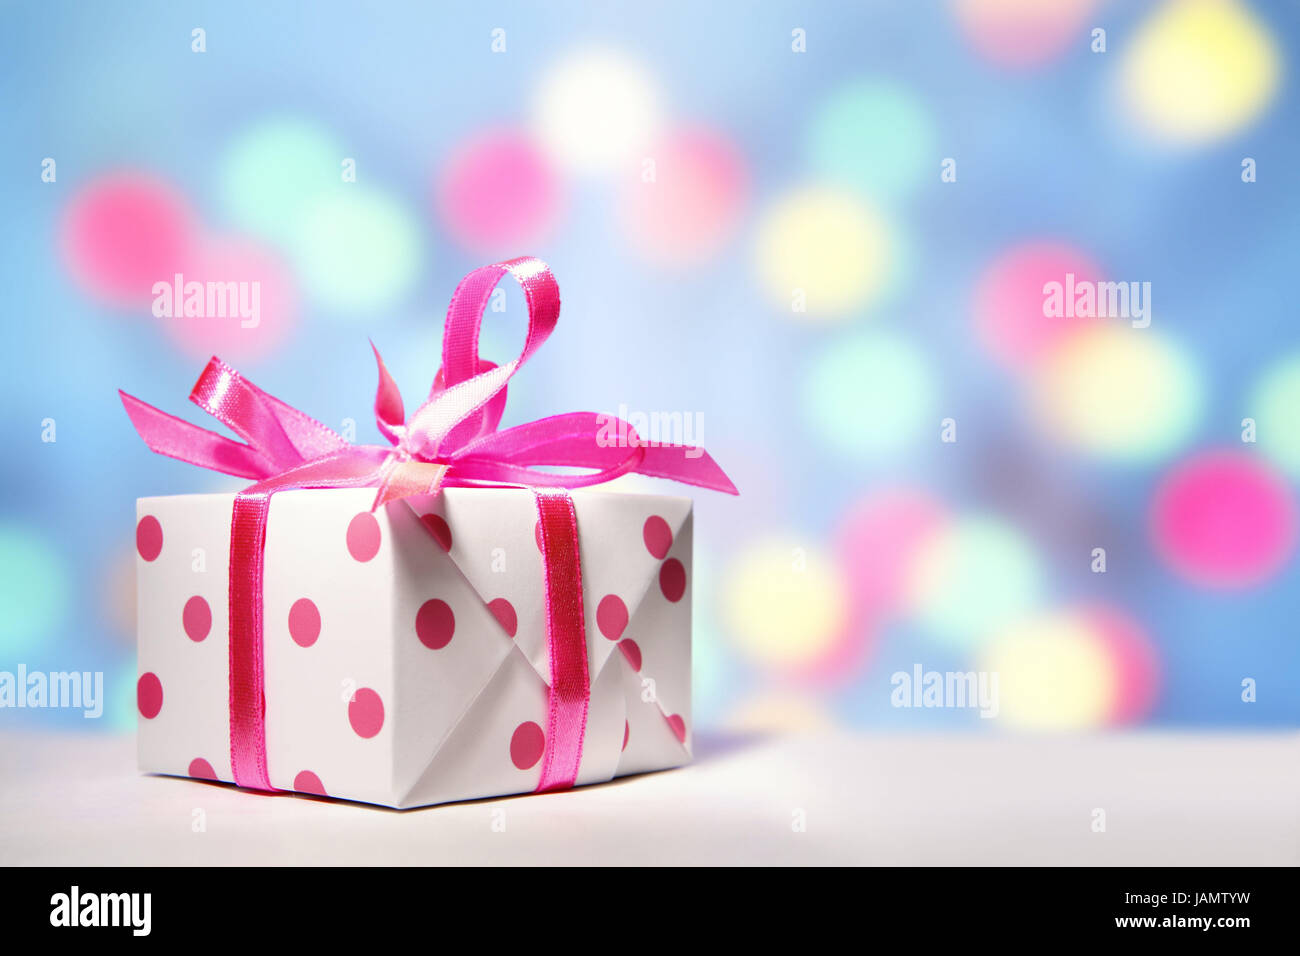 Gift Packagewhite Pinkbackground LightsChristmasValentinstagbirthdayMothers DayjubileeValentinsgeschenkebirthday PresentsMothers Day Presents